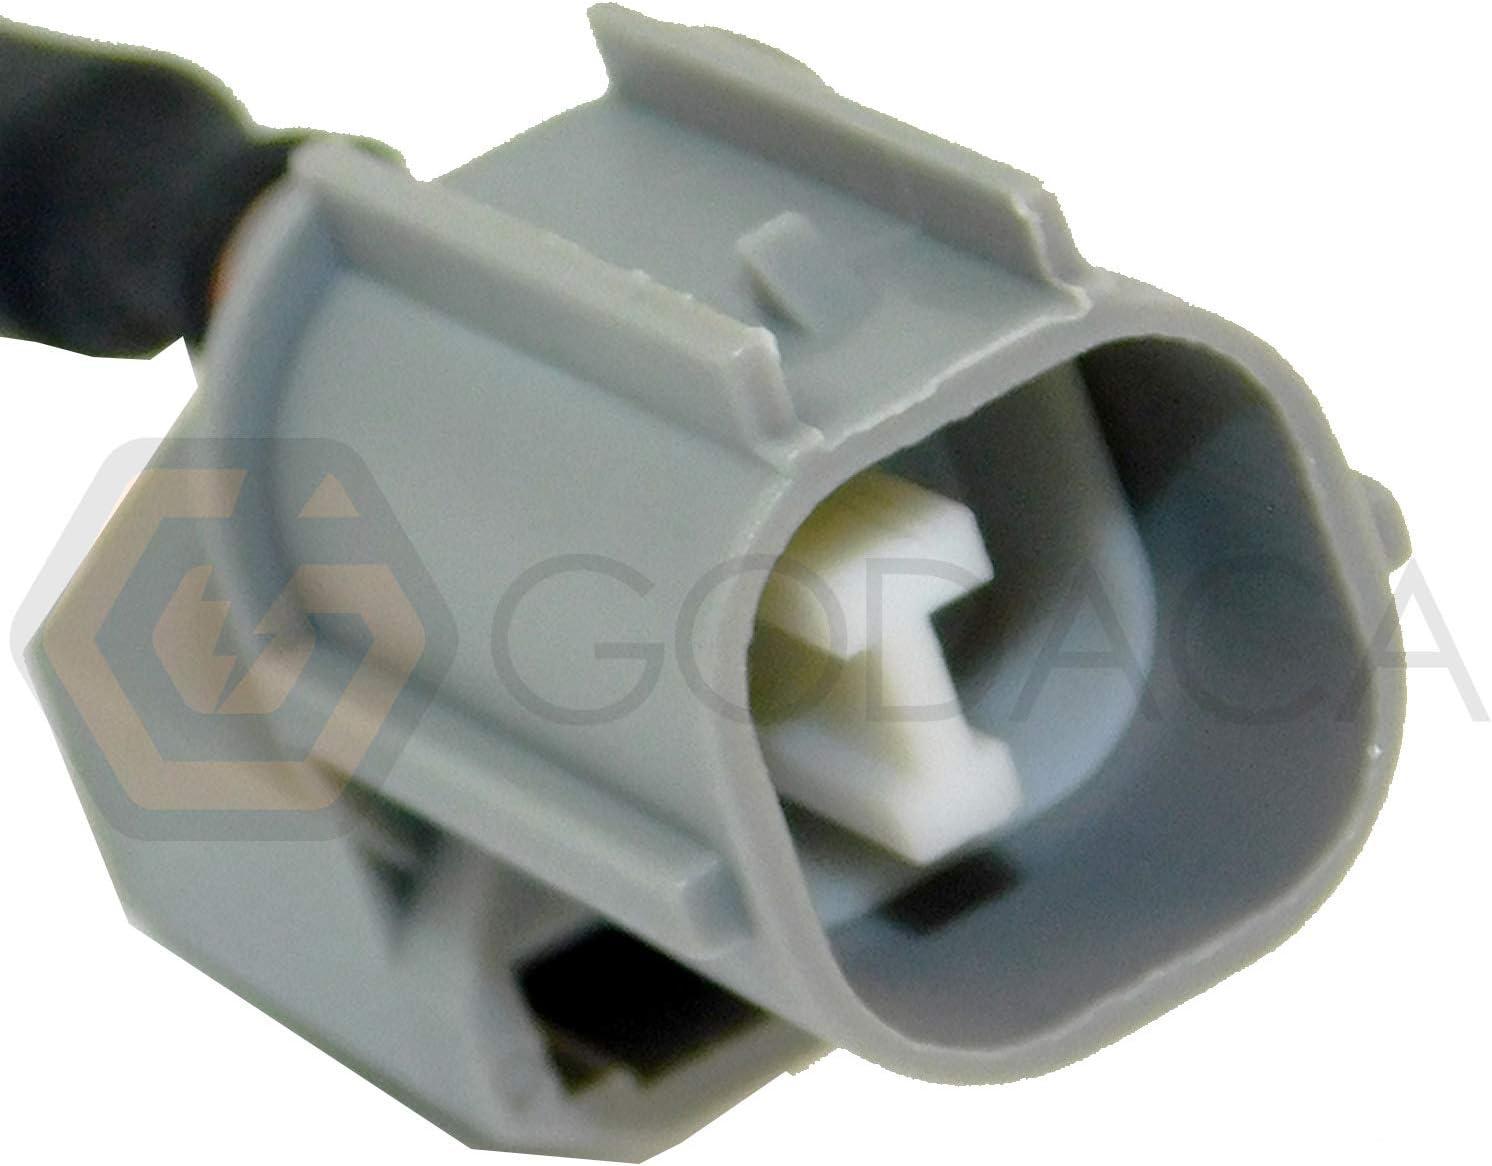 Acura Knock Sensor Wire Connector 30531-P8F-A00 Genuine For Honda